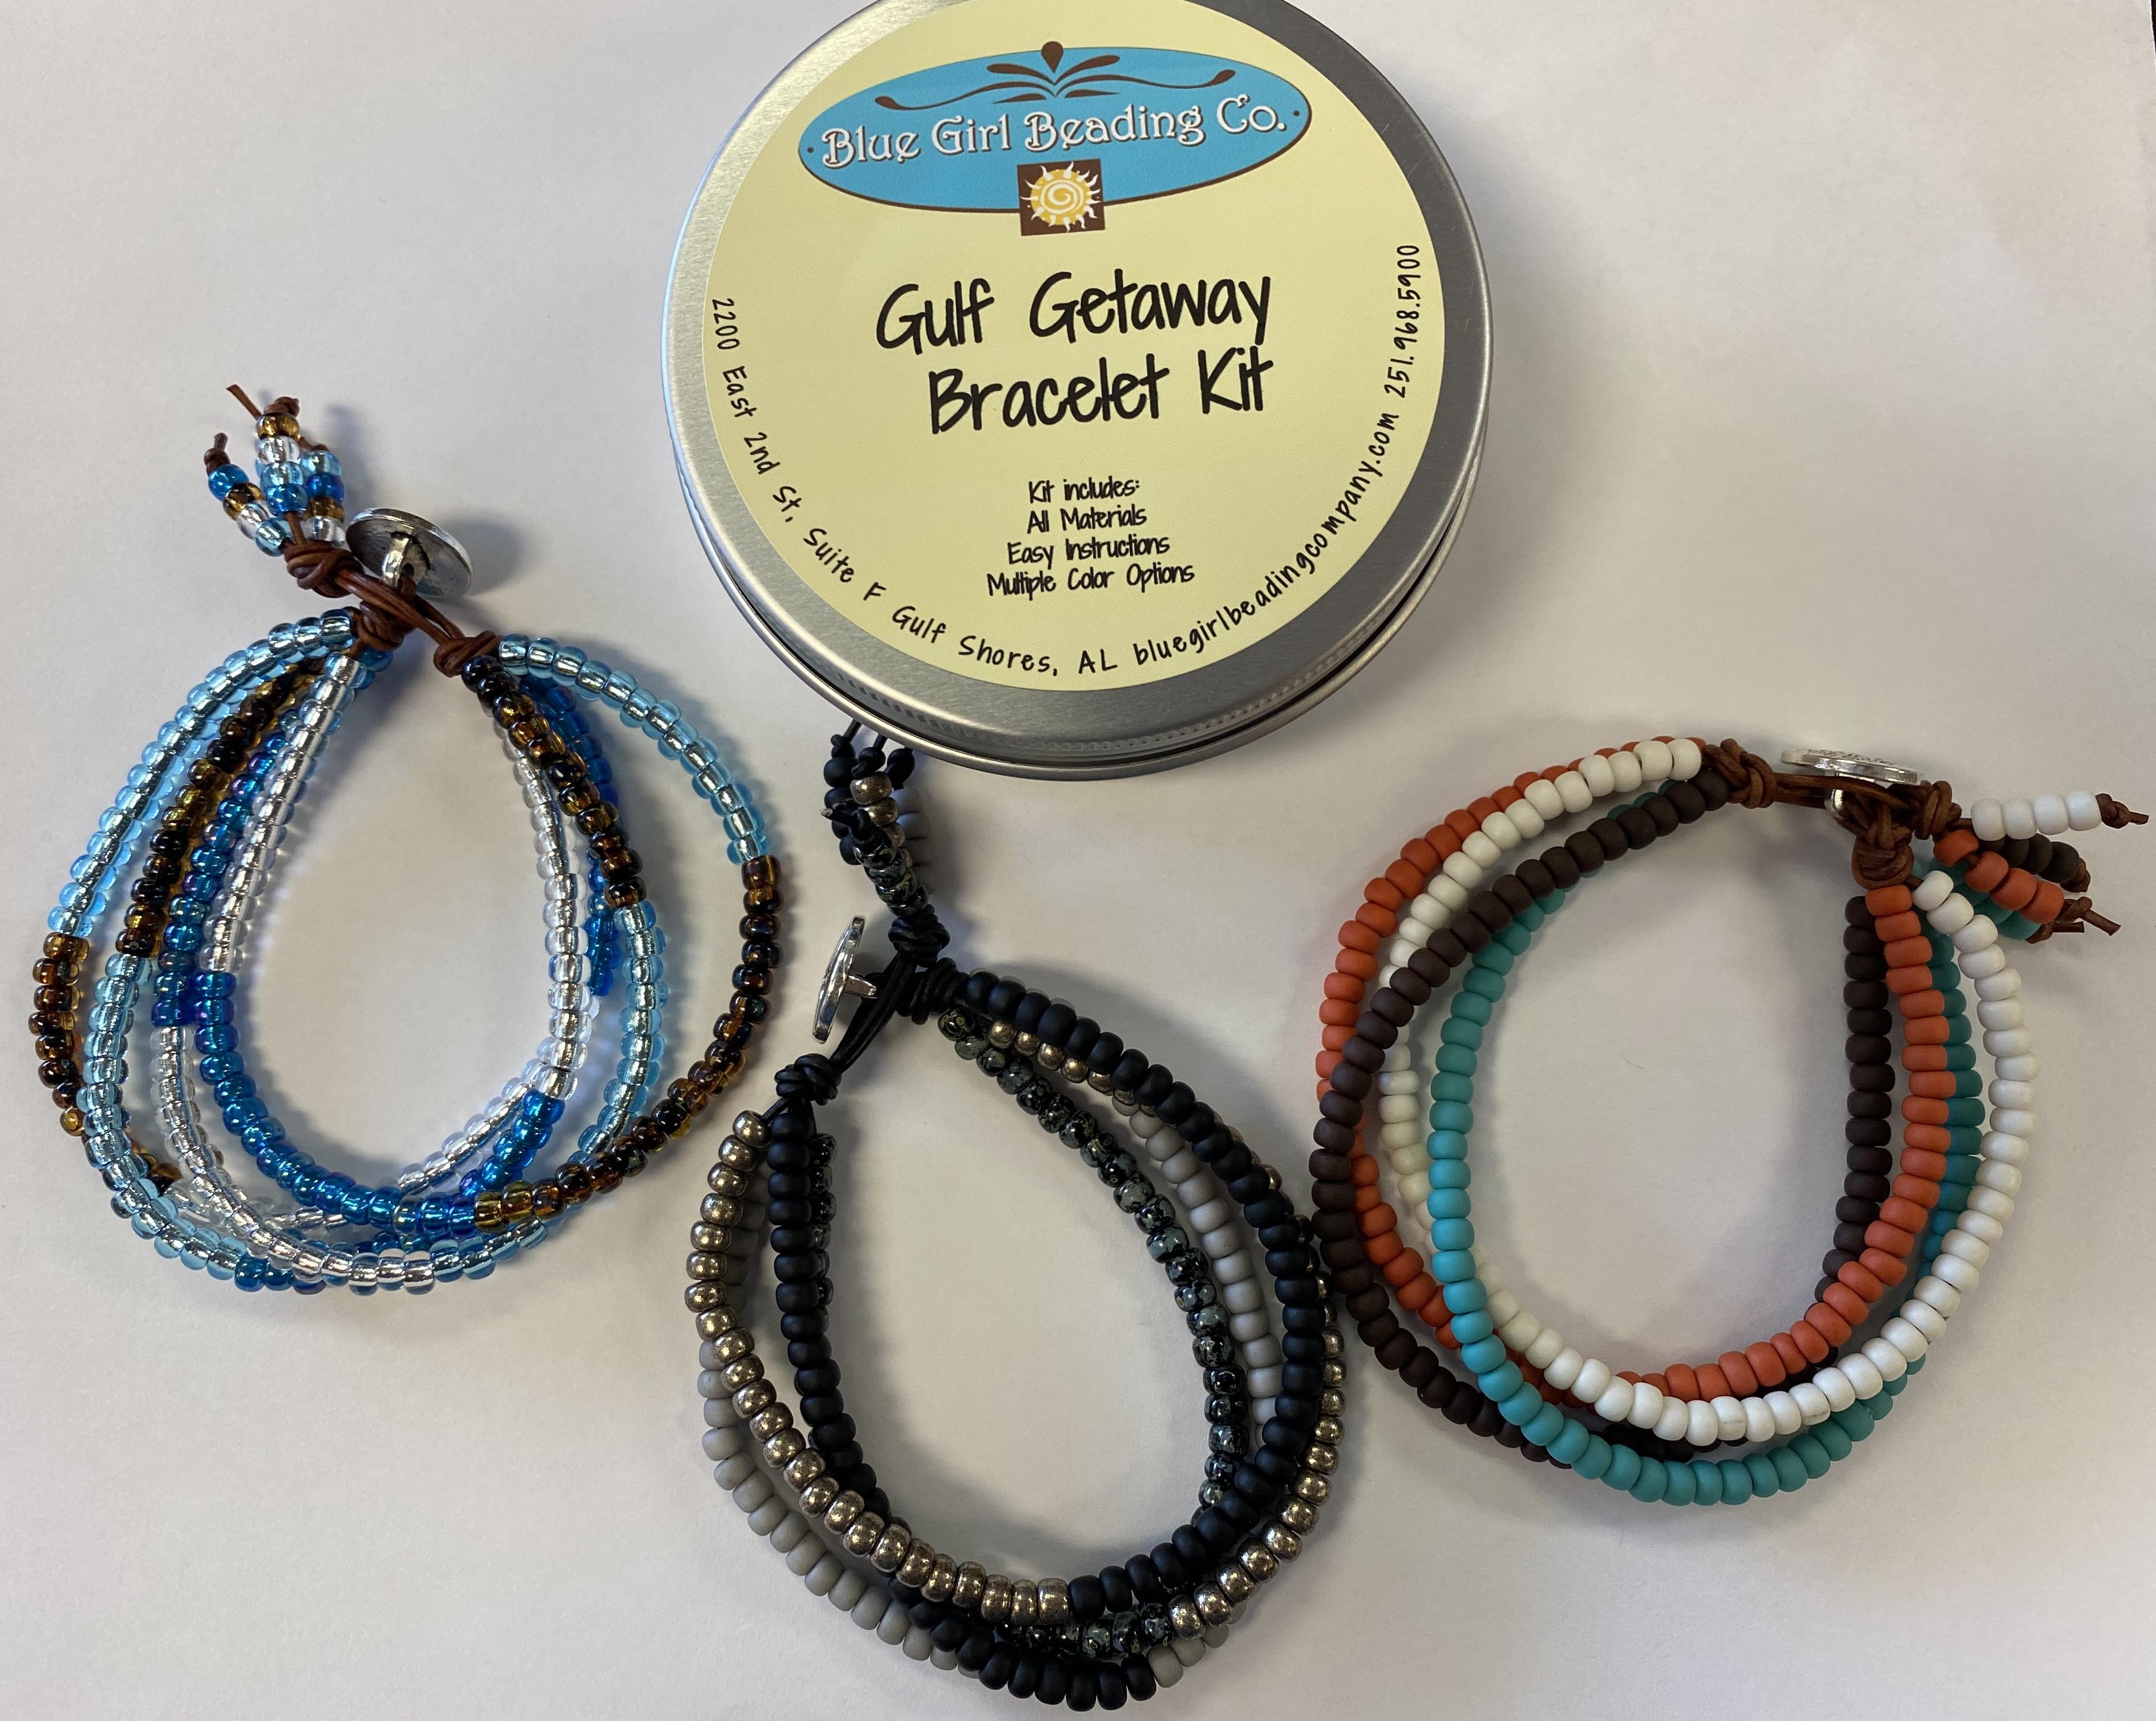 Gulf Getaway